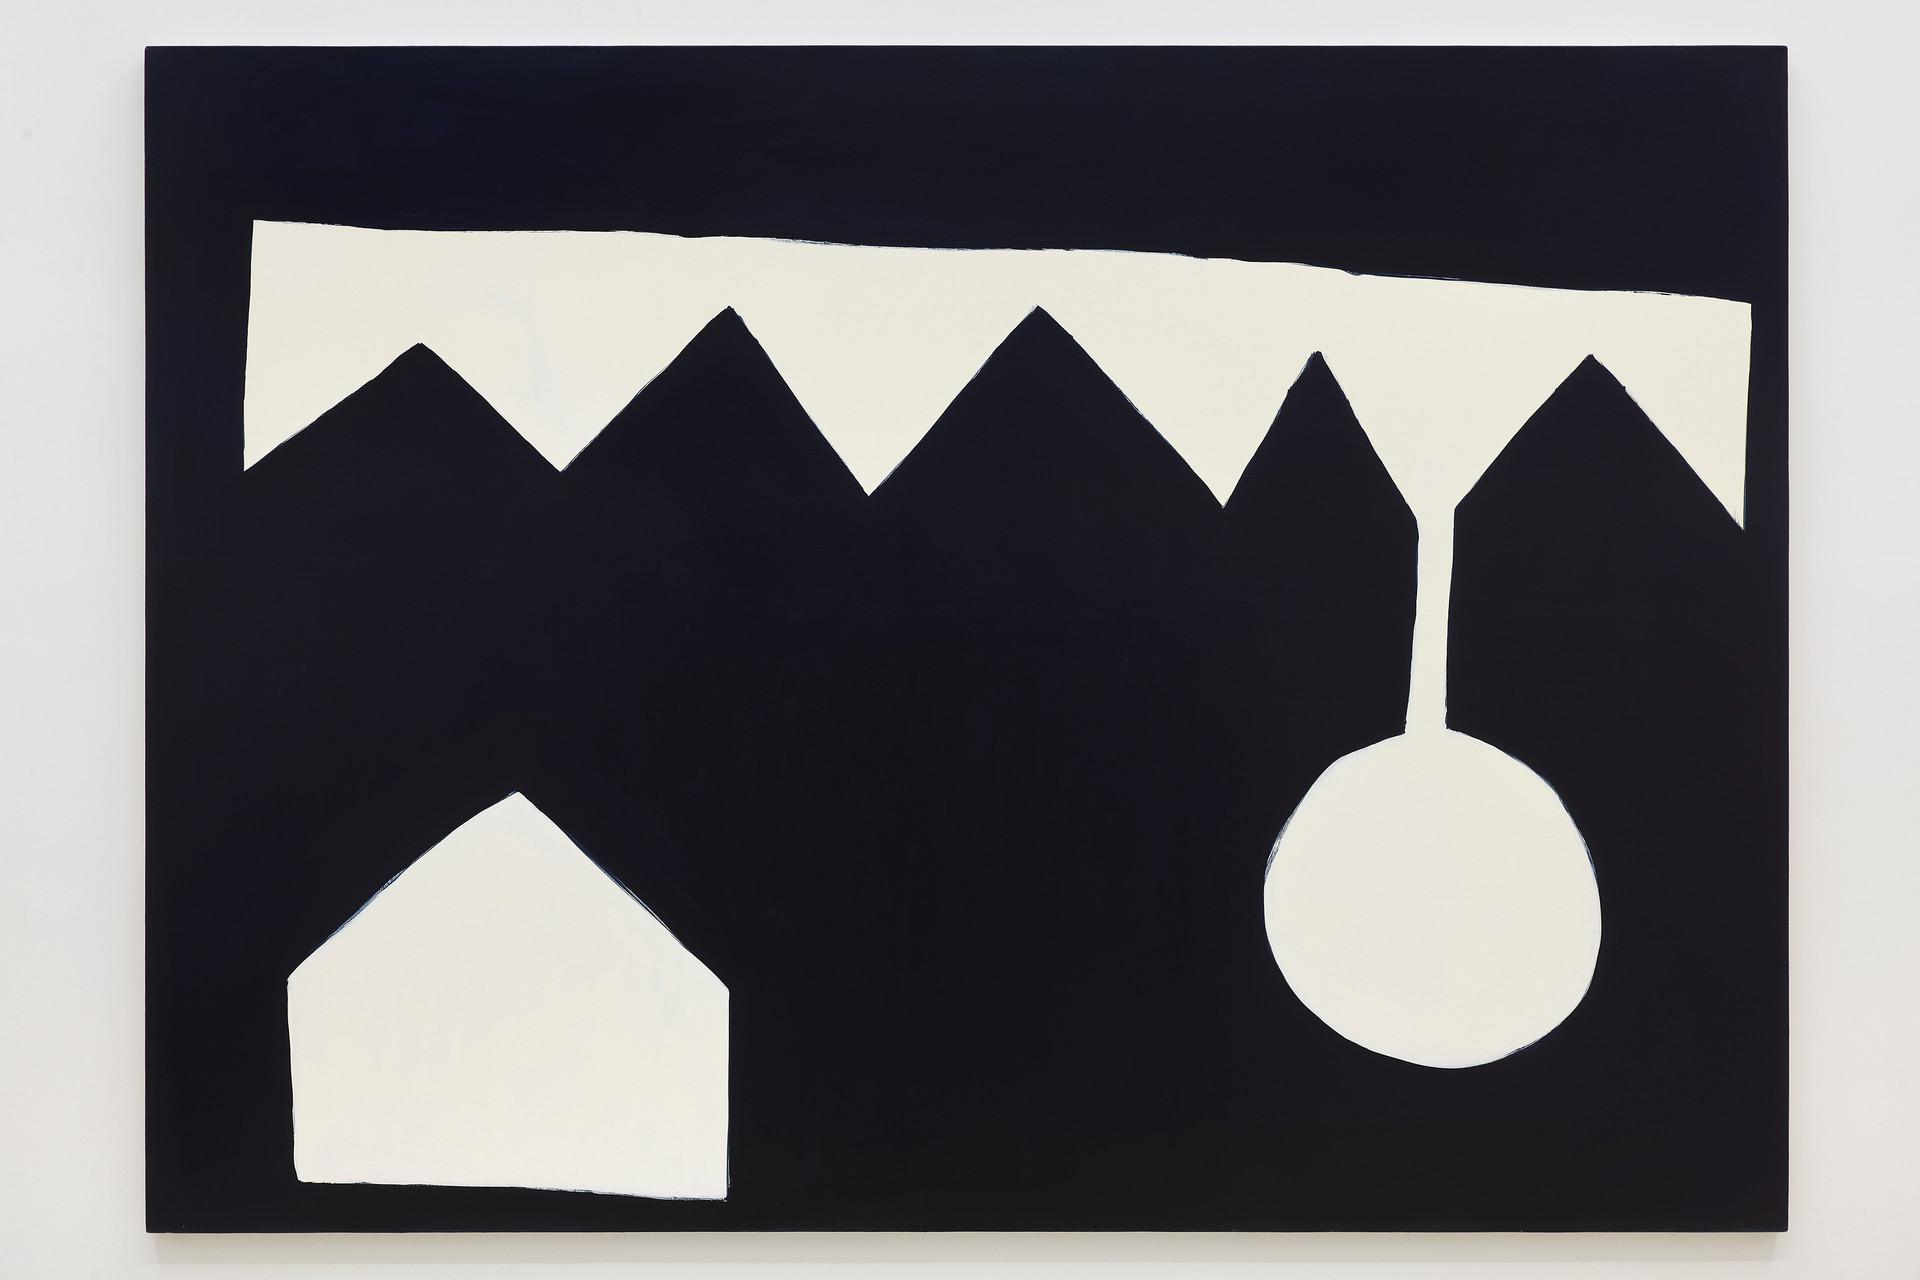 Stephen Felton Nightfall, 2020 Acrylic on canvas 63 x 88 inches